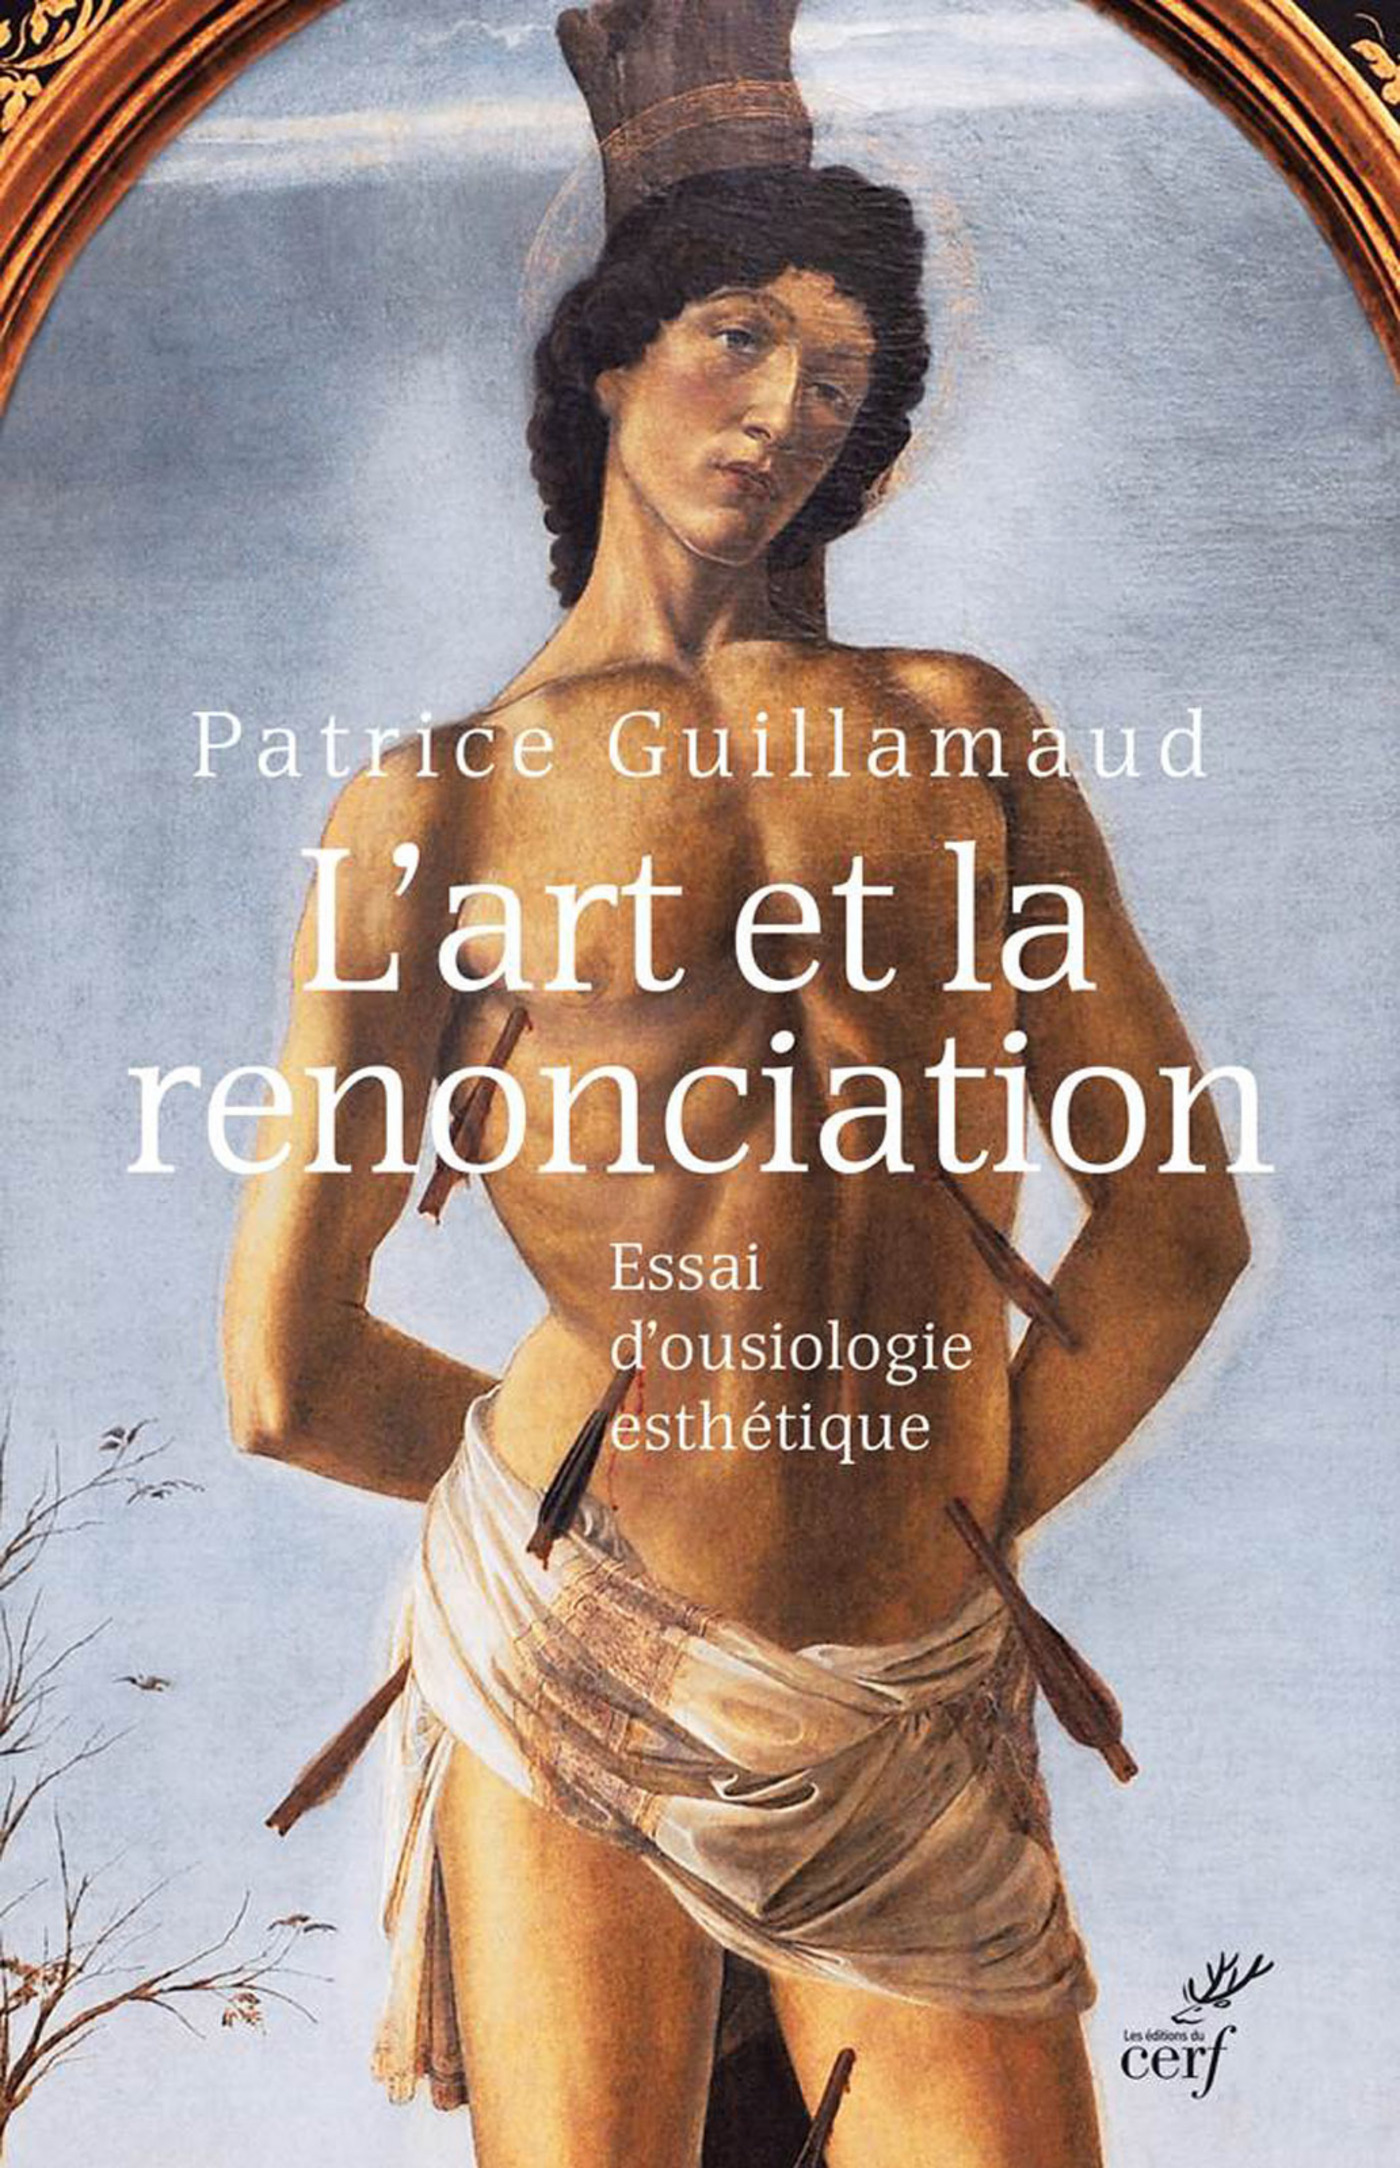 L'ART ET LA RENONCIATION